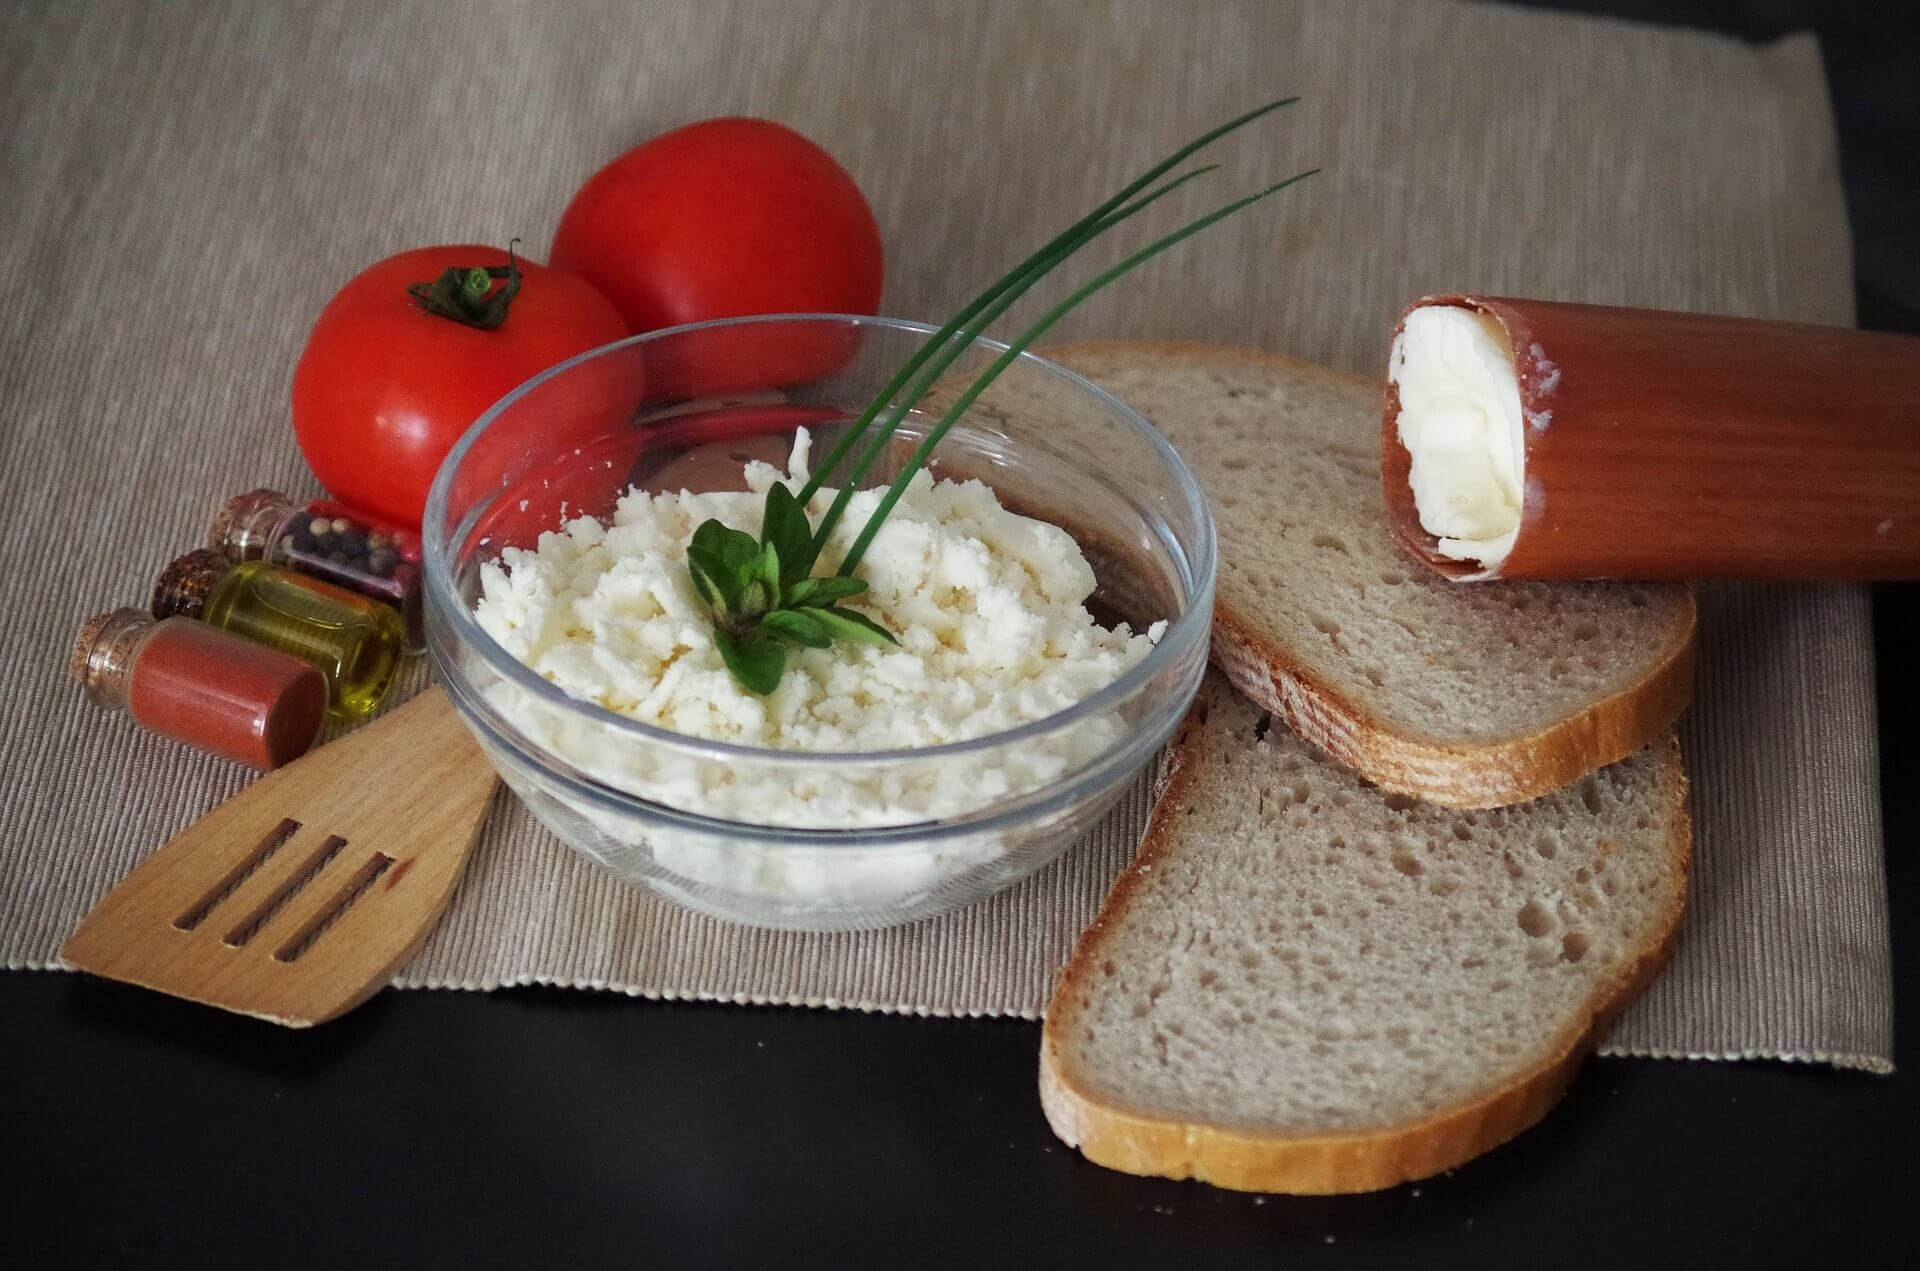 recepty z bryndze - bryndza v miske na stole s chlebom a paradajkami